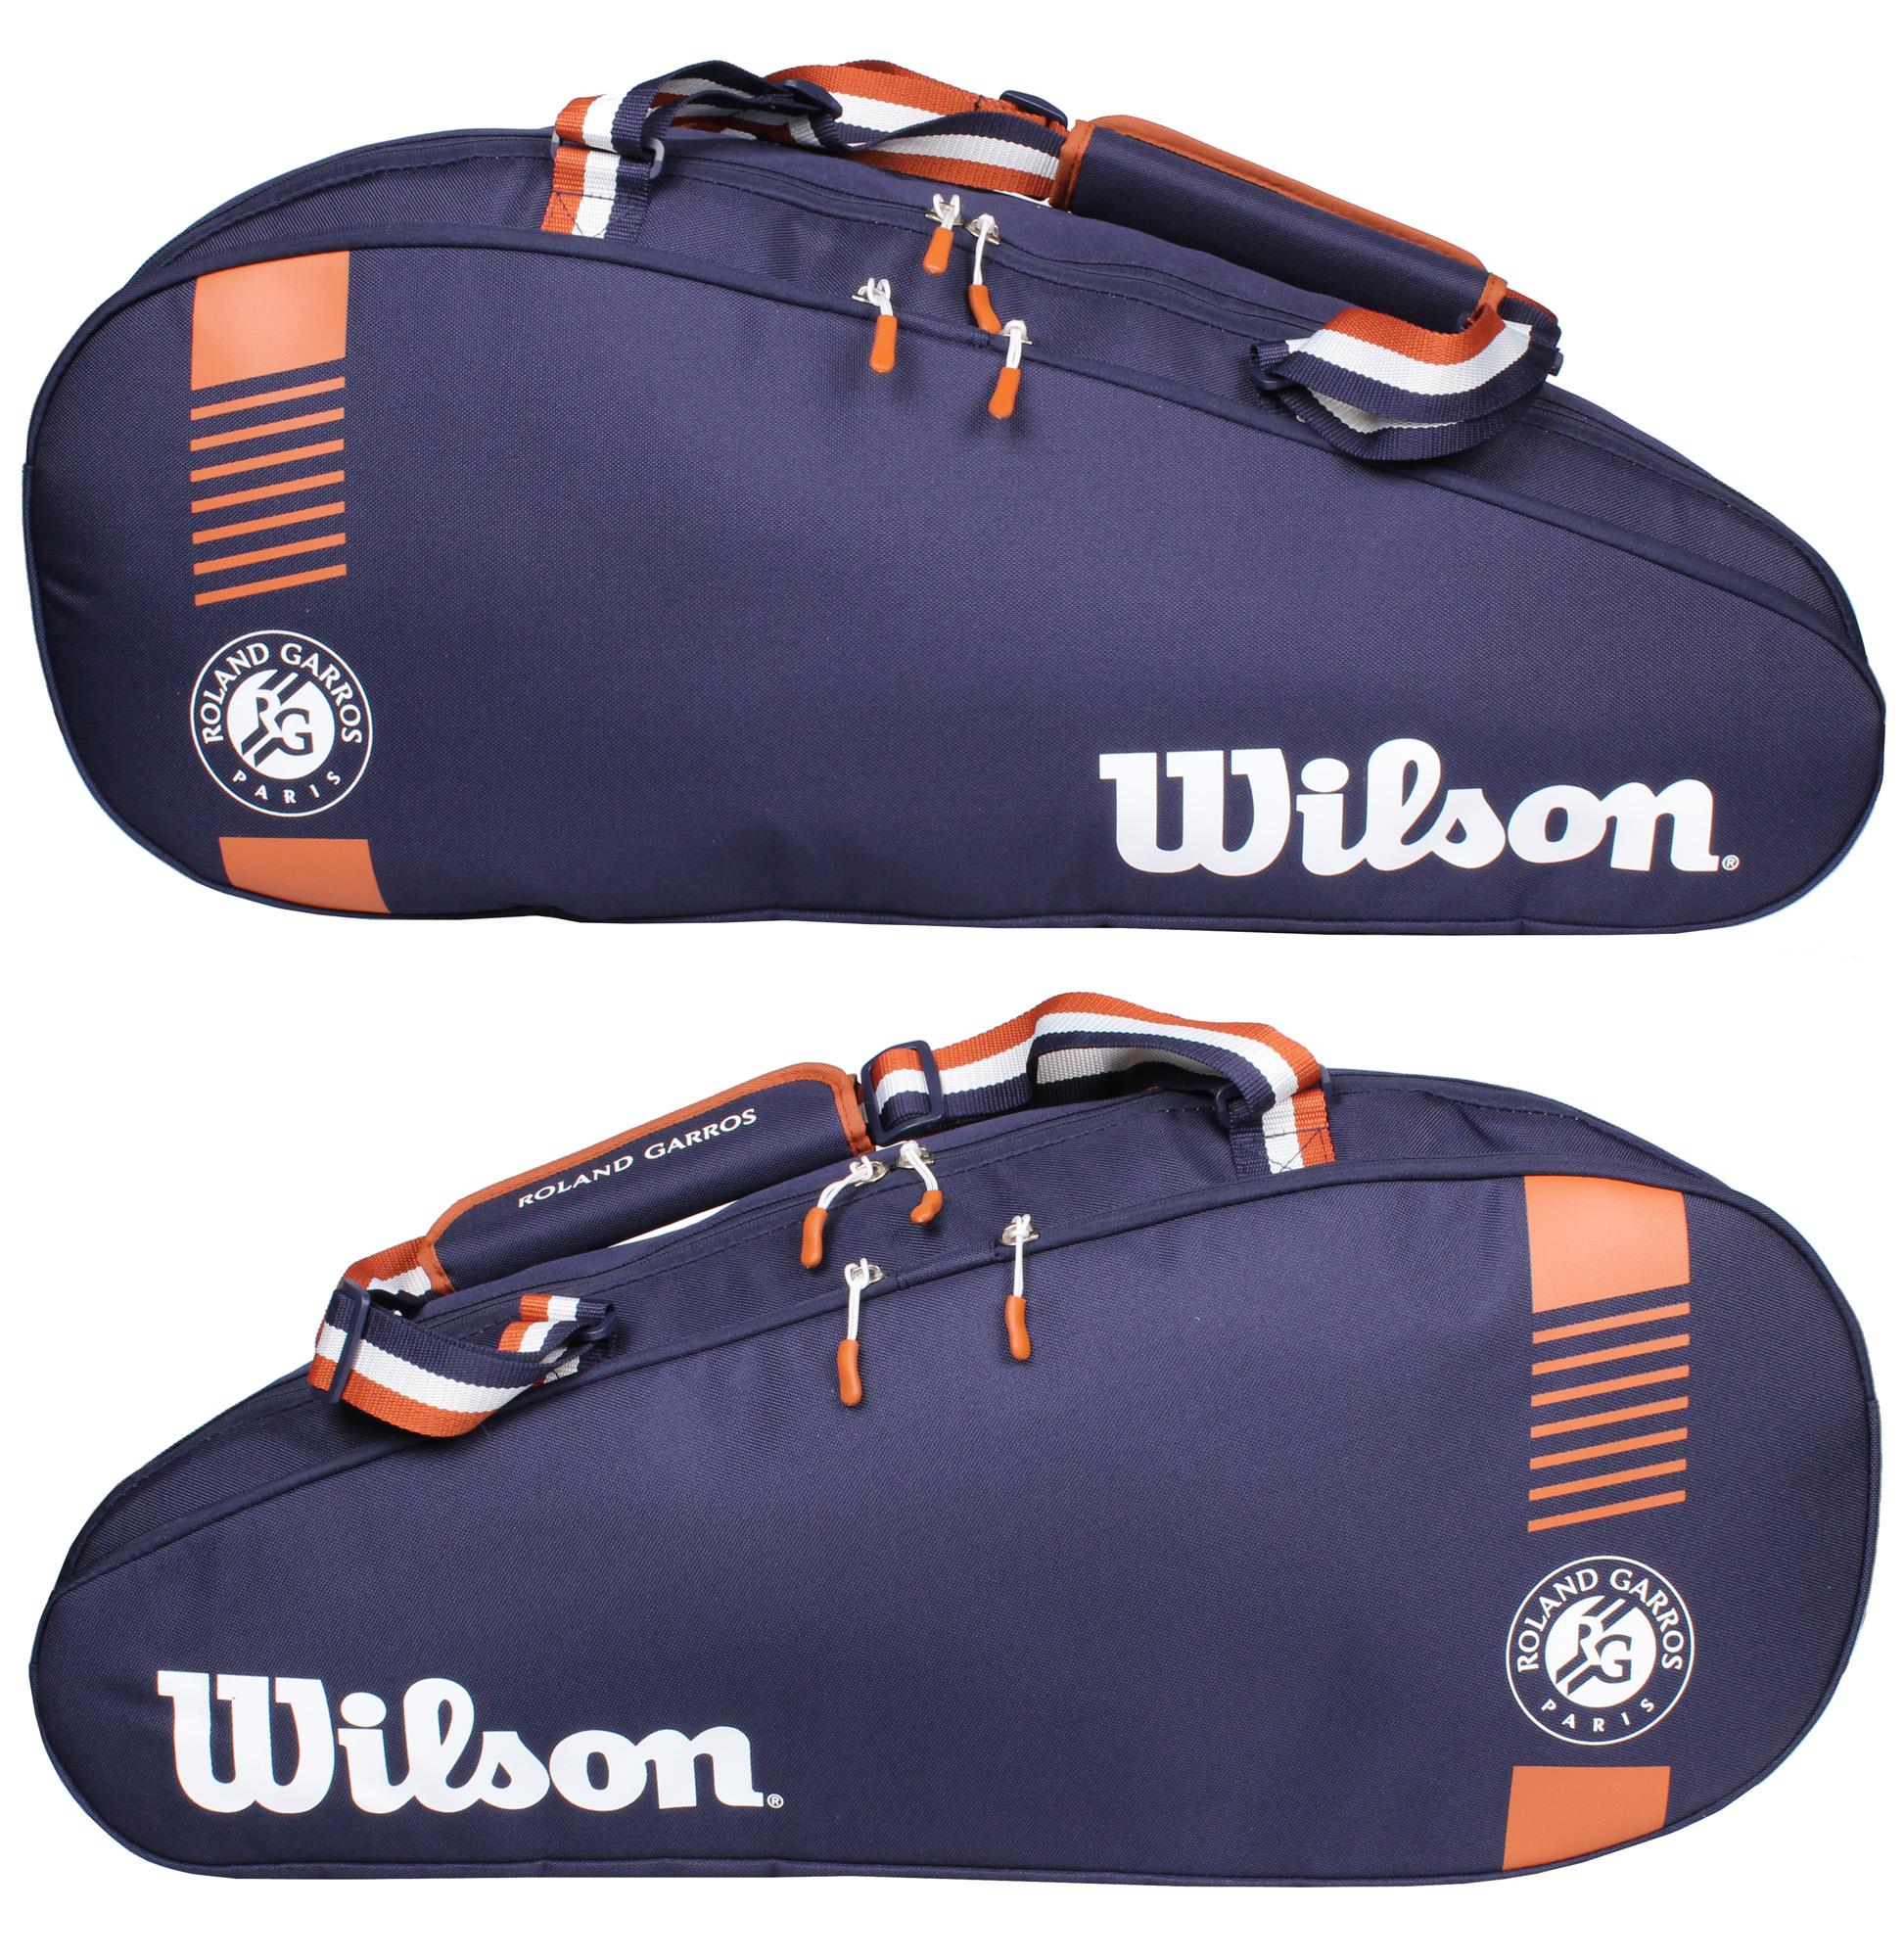 TÚI TENNIS WILSON ROLAND GARROS TEAM 3PK (WR80068010011)